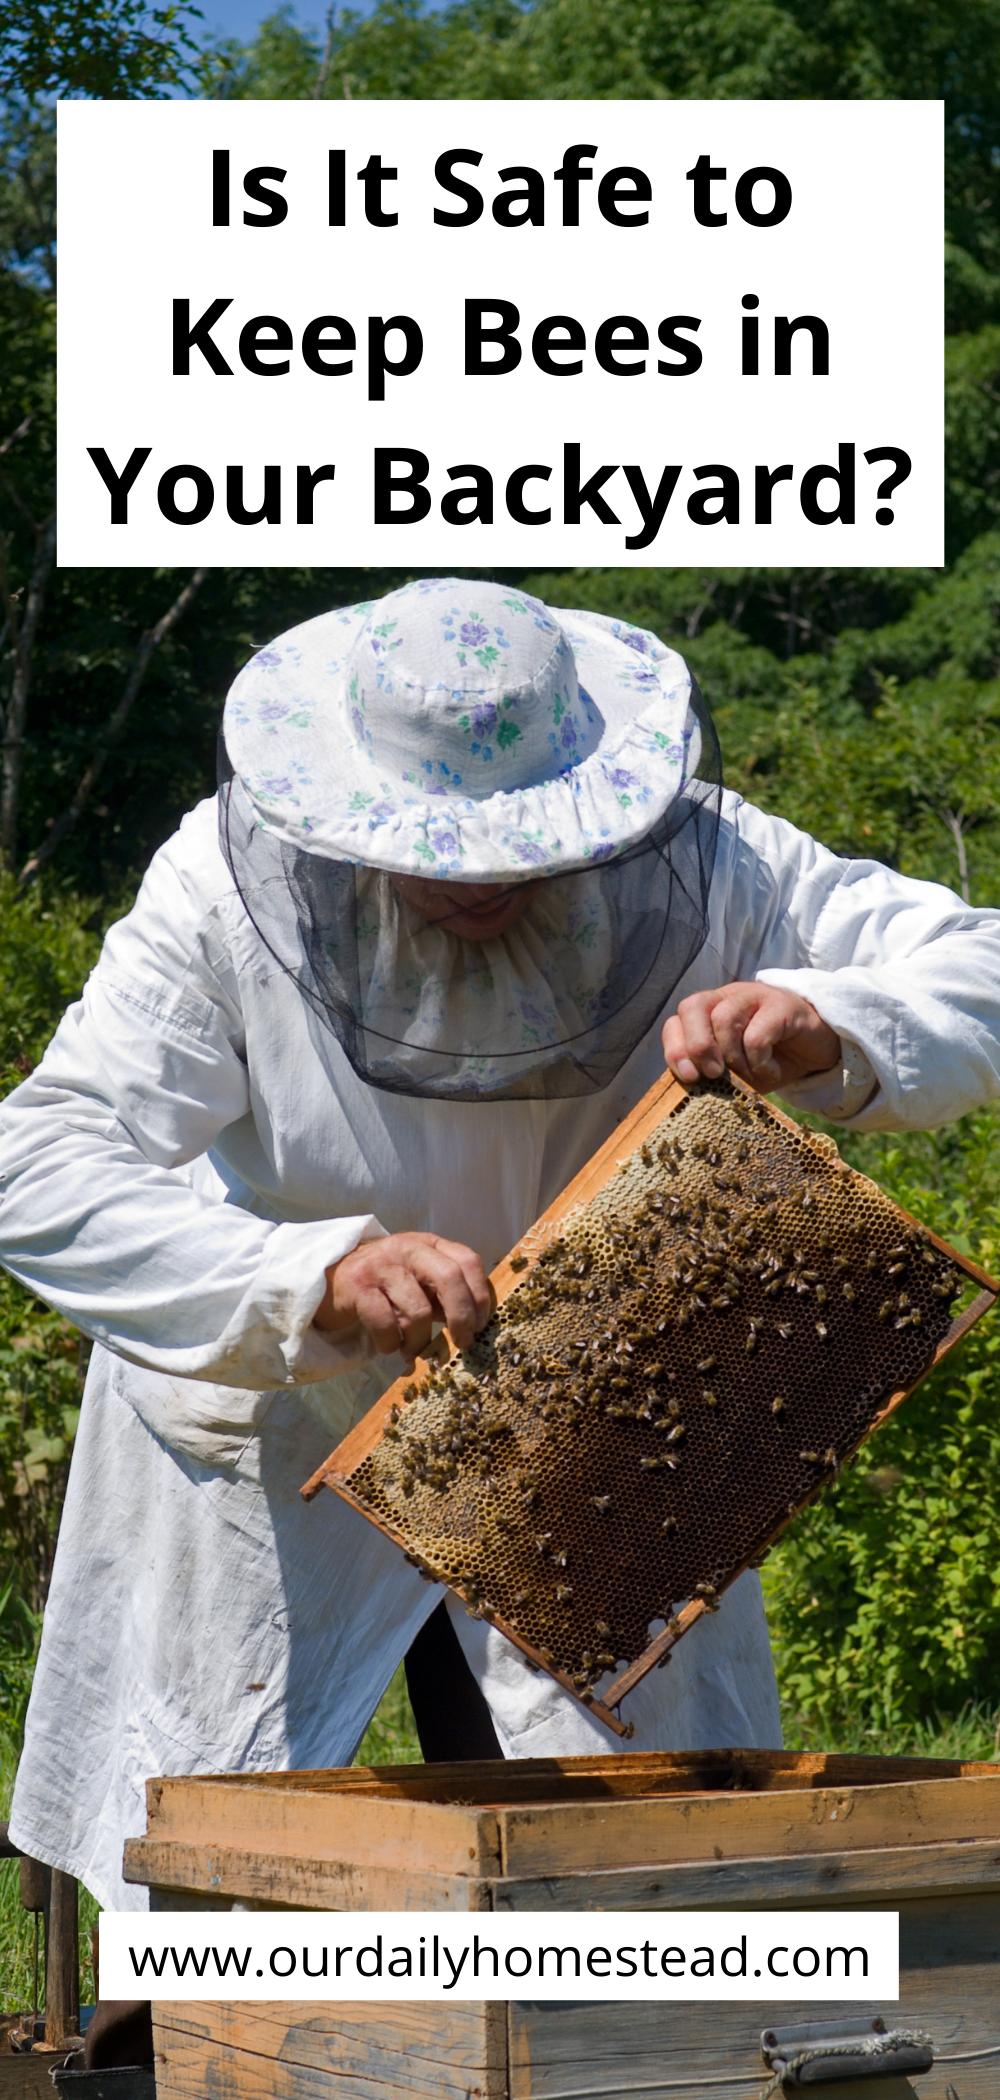 Beekeeping For Beginners Is It Safe To Keep Bees In Your Backyard In 2021 Beekeeping For Beginners Backyard Bee Keeping